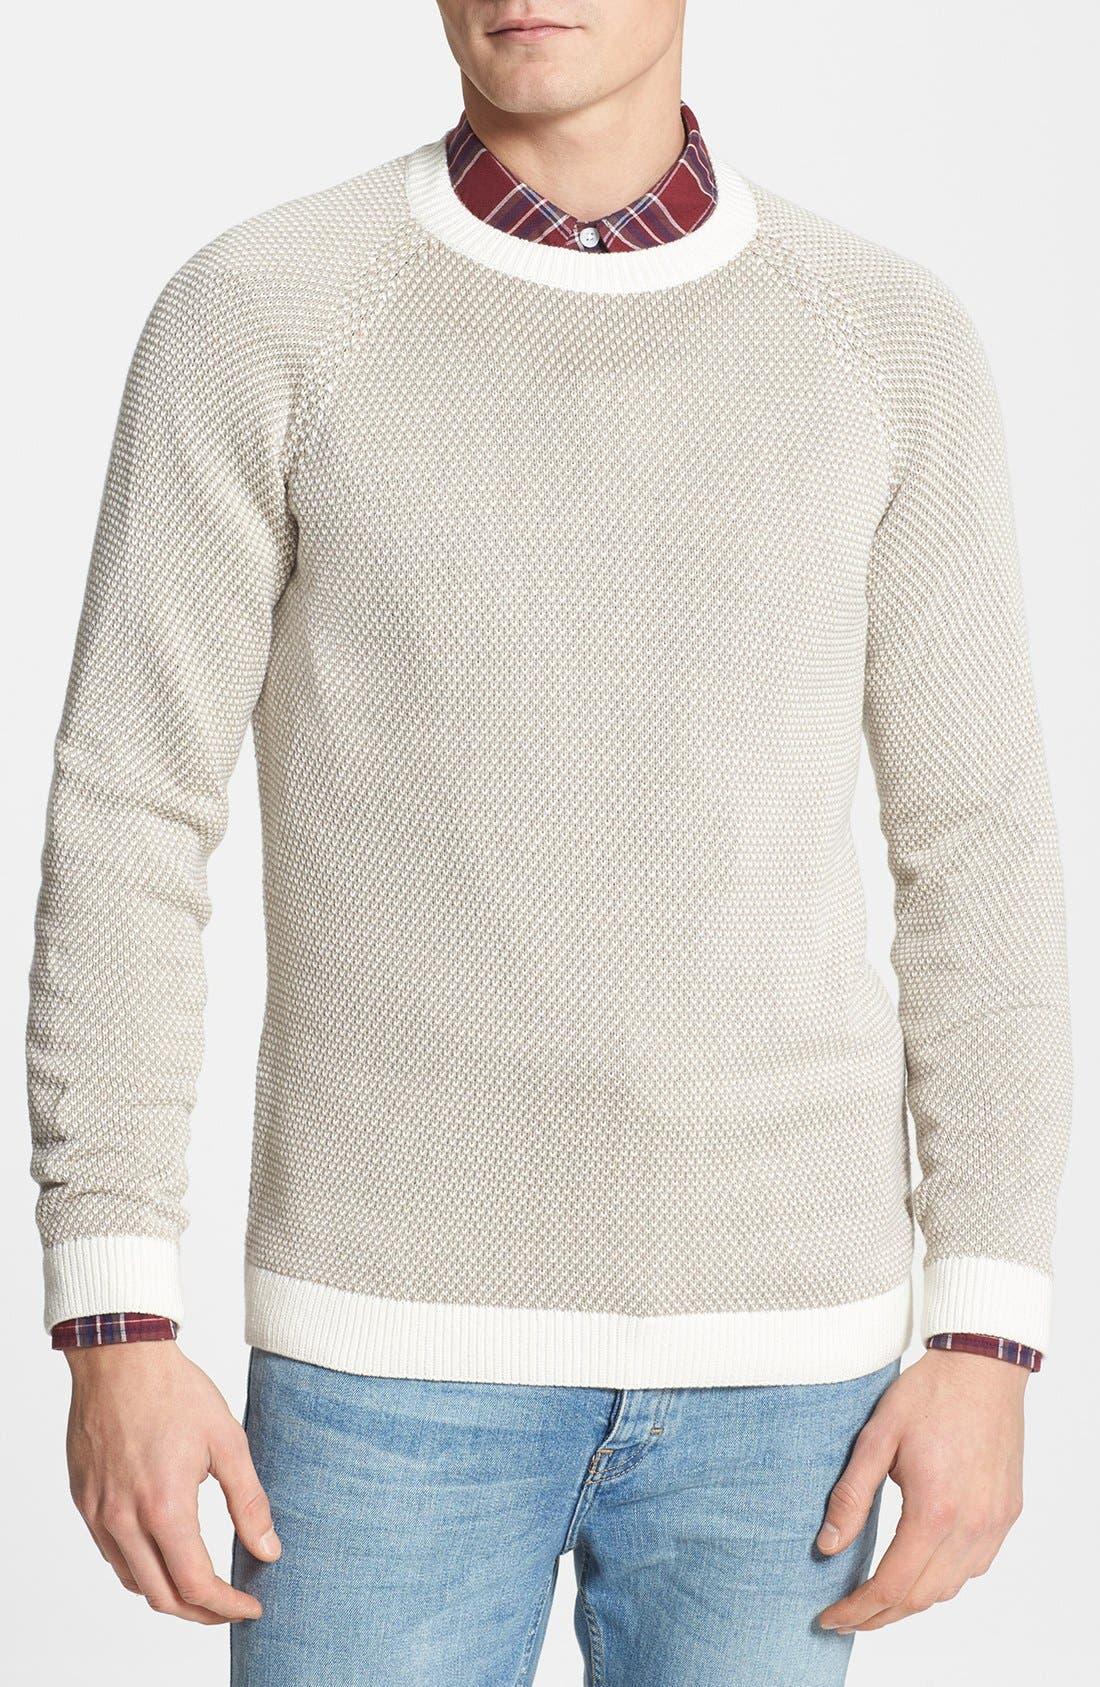 Main Image - Topman Reverse Knit Crewneck Sweater